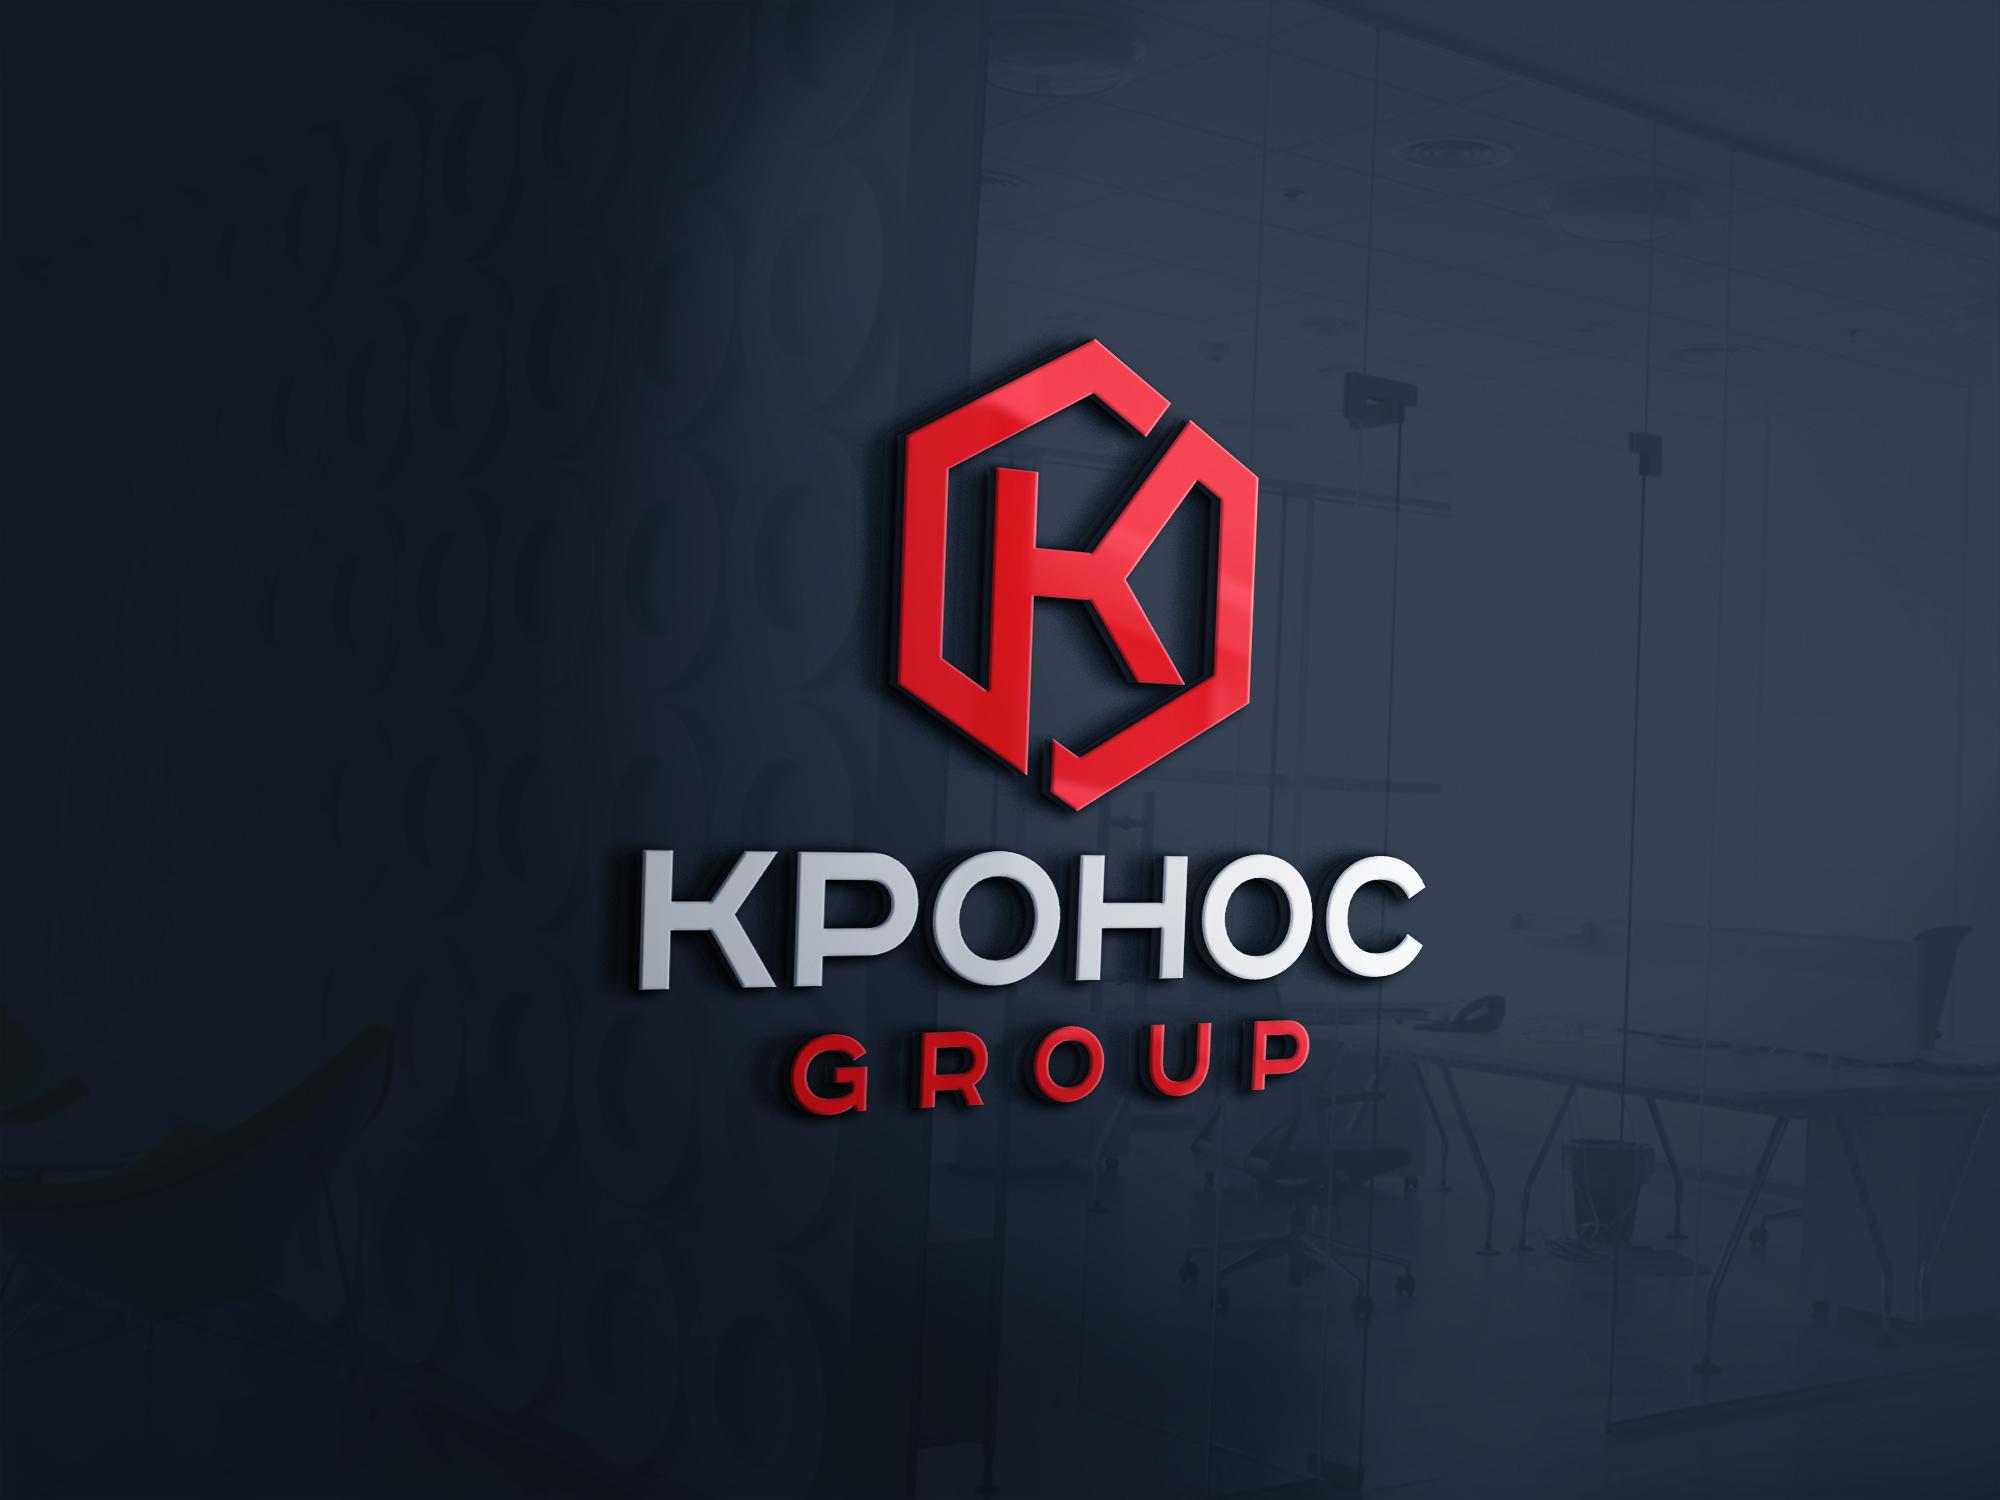 Разработать логотип KRONOS фото f_5575fb575d952afb.jpg